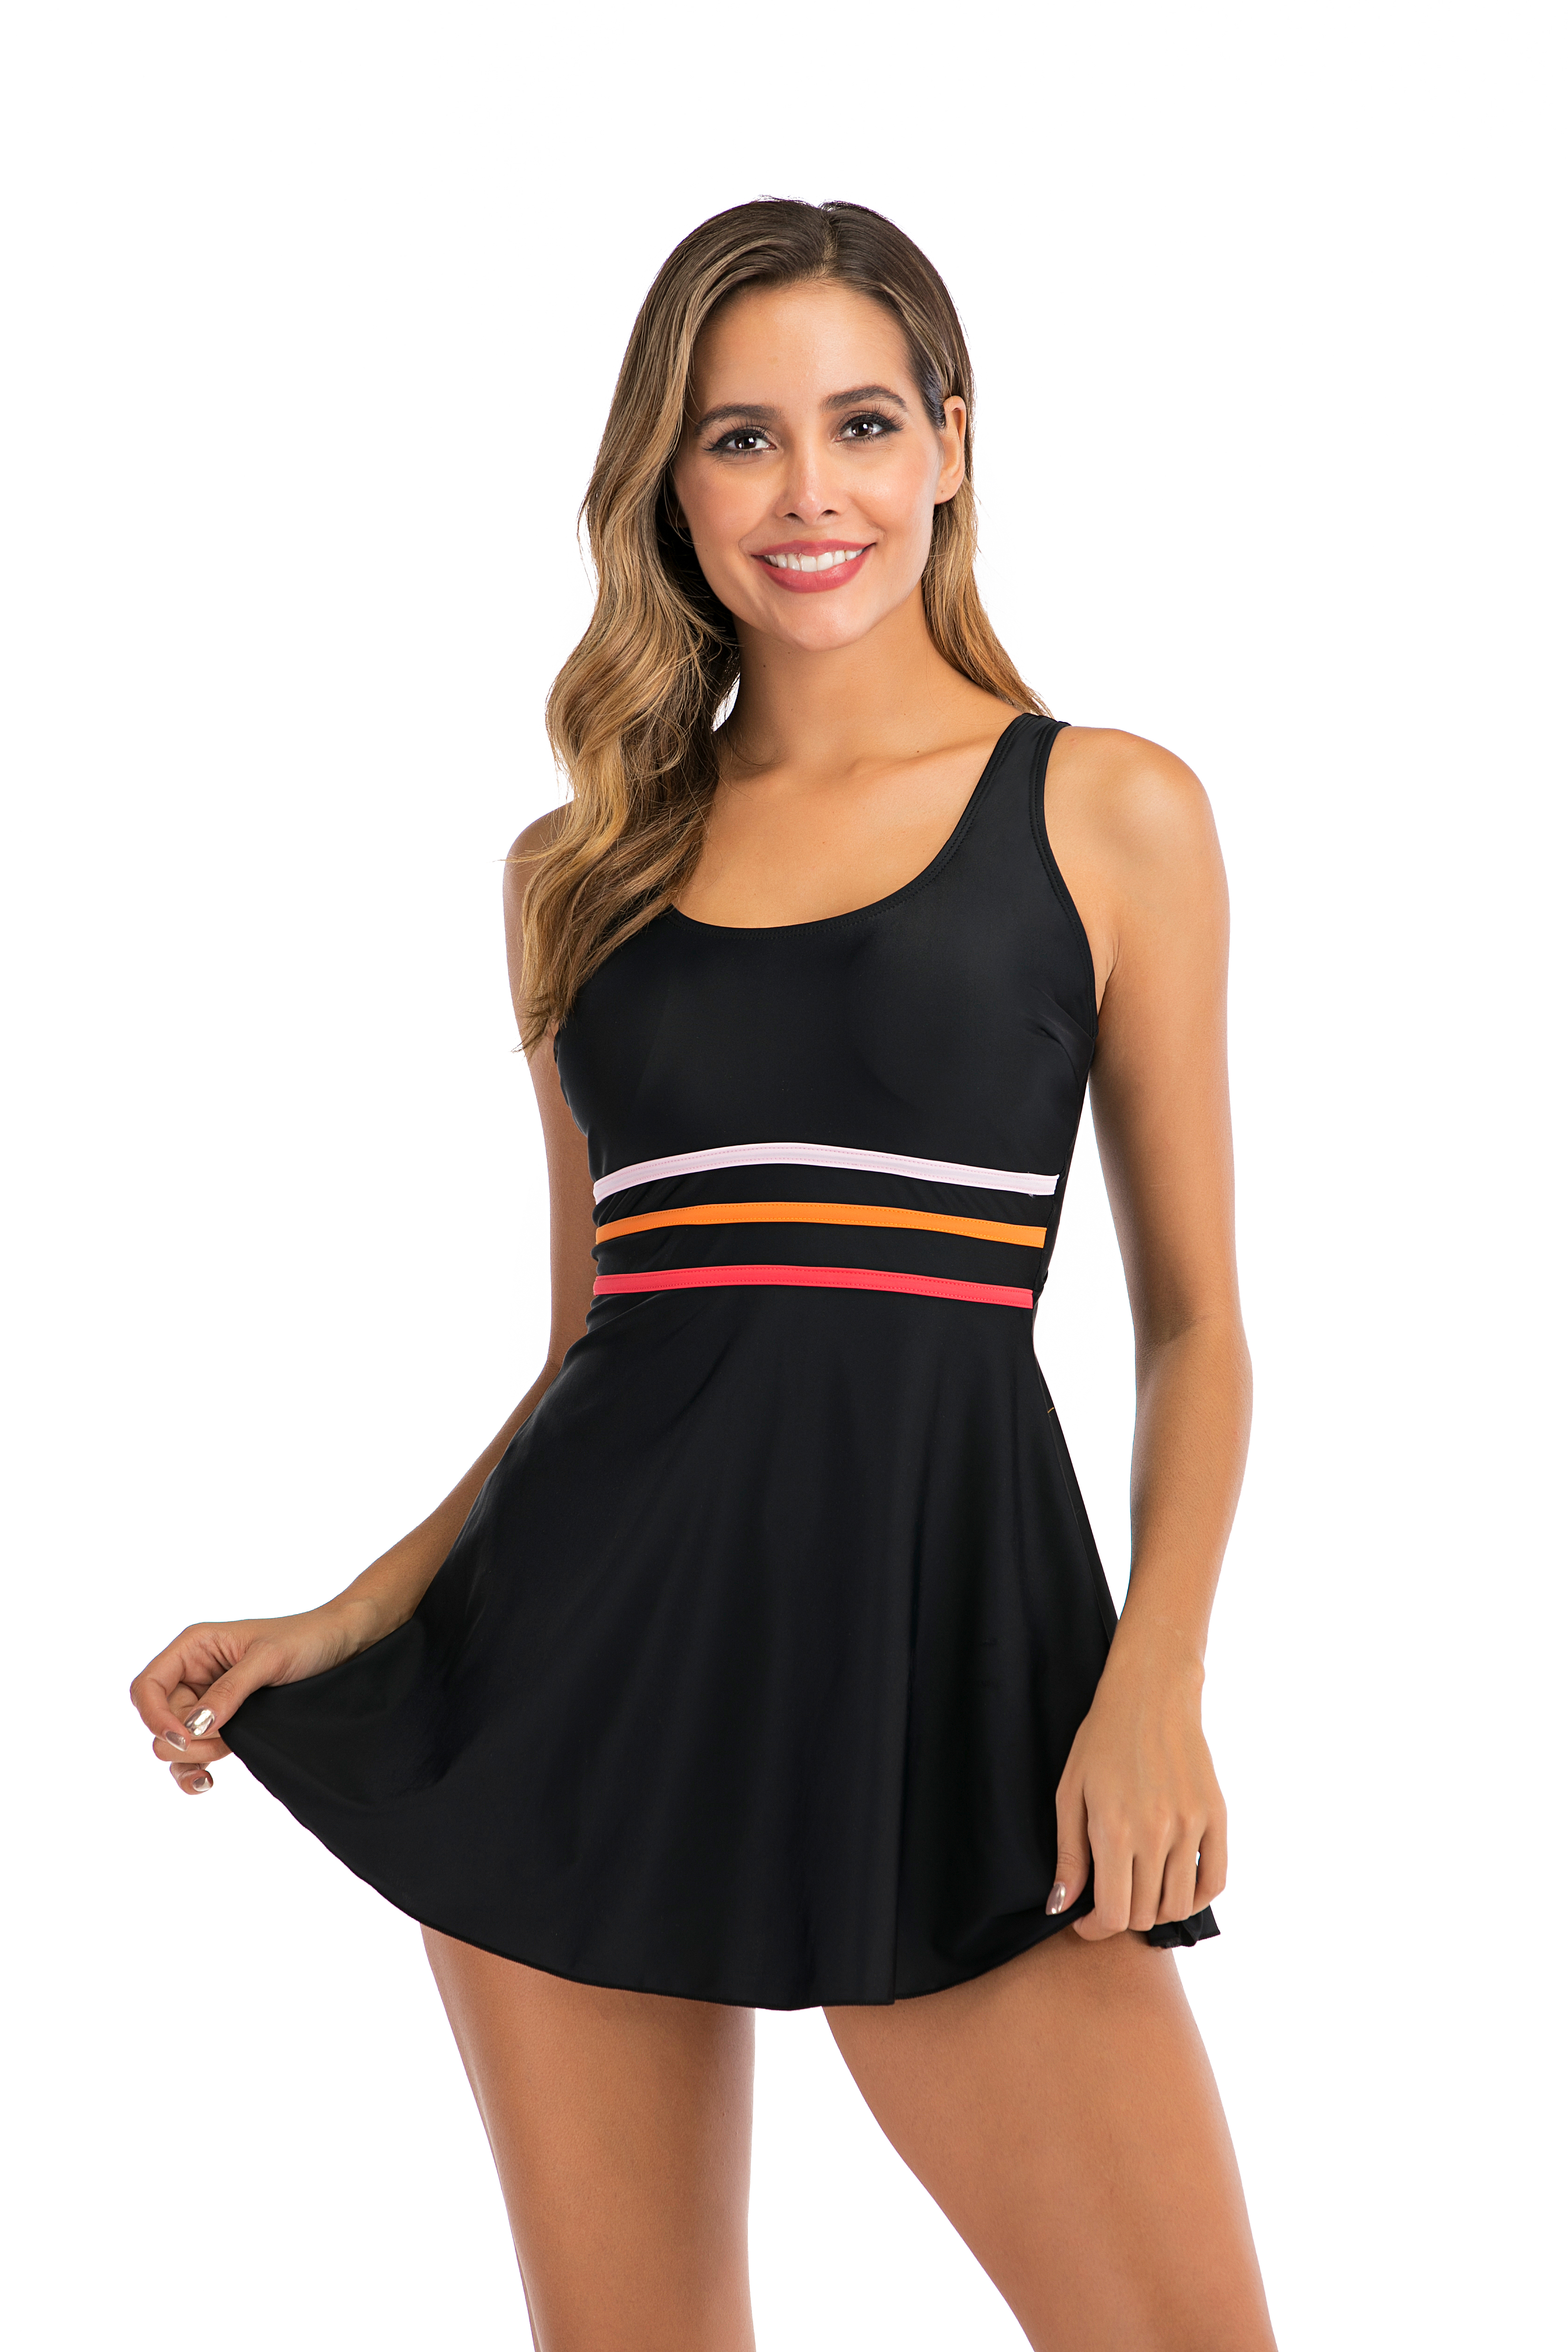 Plus Size Tankini Sport Swimsuit Dress Swimming Suit Women Swimwear Skirt Big Size Sexy Swimsuit Padded Beach Bathing Suit S-5XL